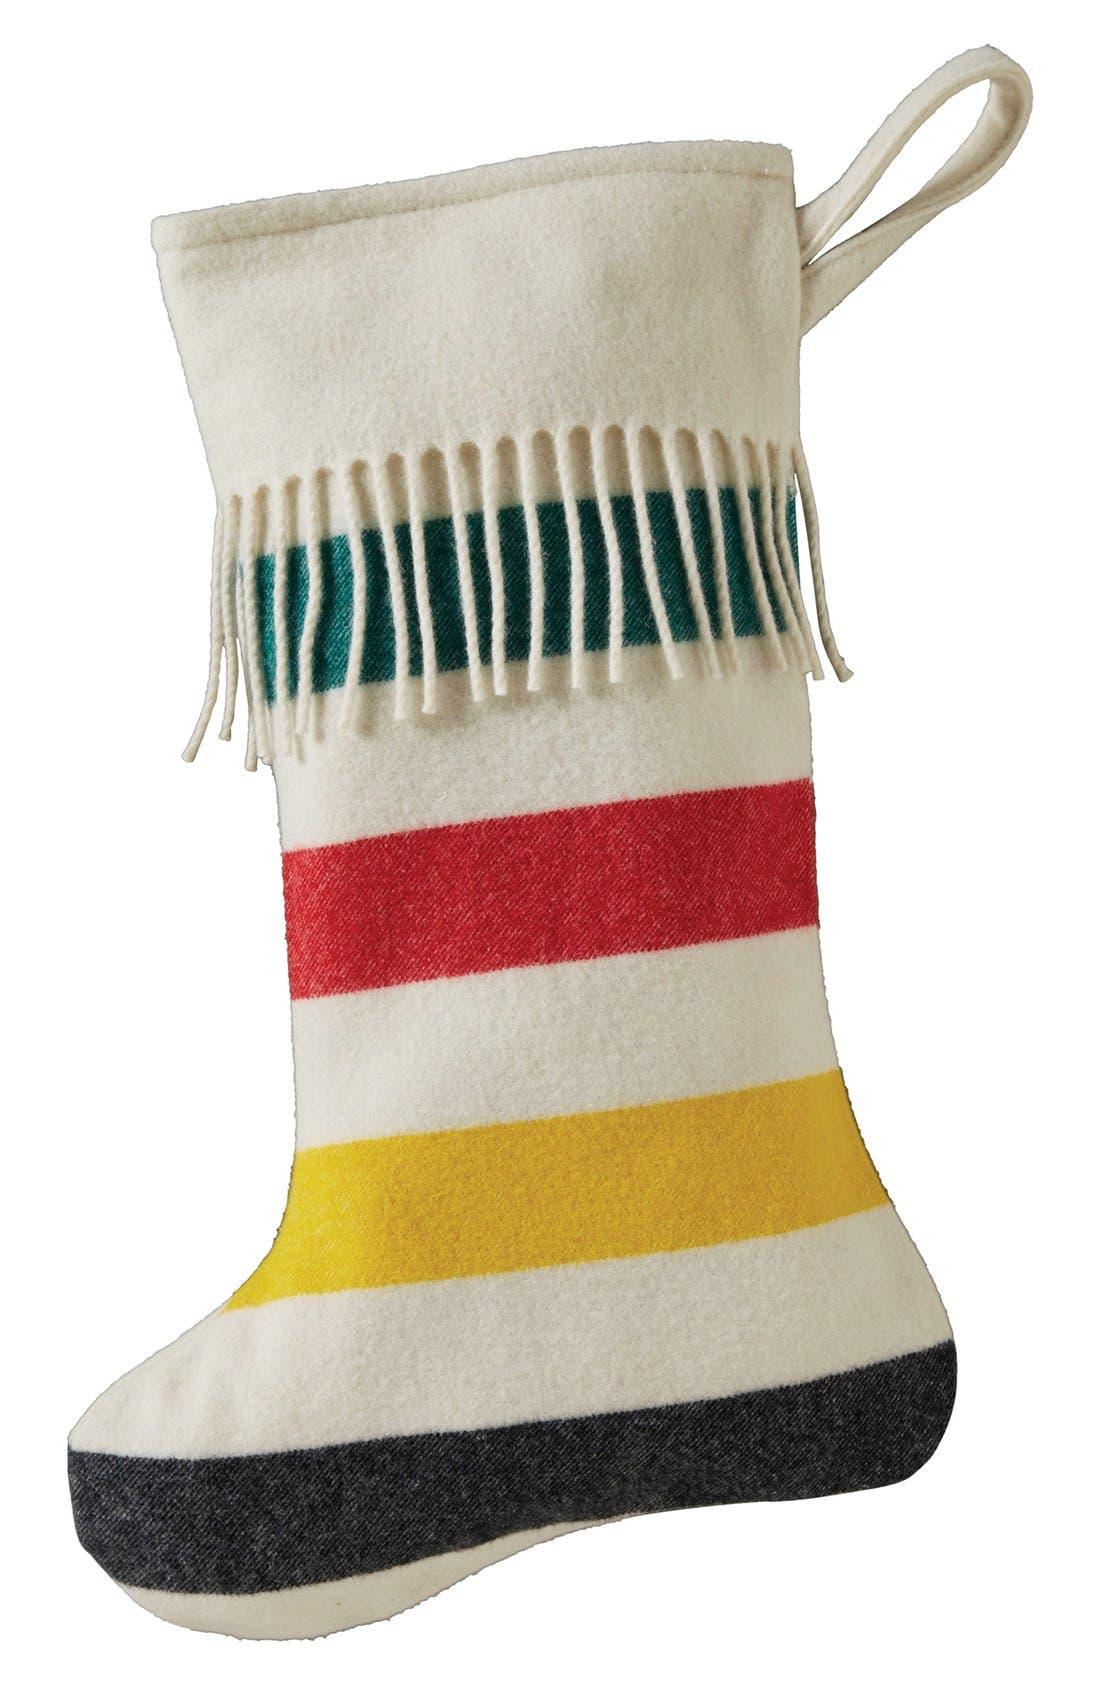 Alternate Image 1 Selected - Pendleton'Glacier Stripe' Stocking